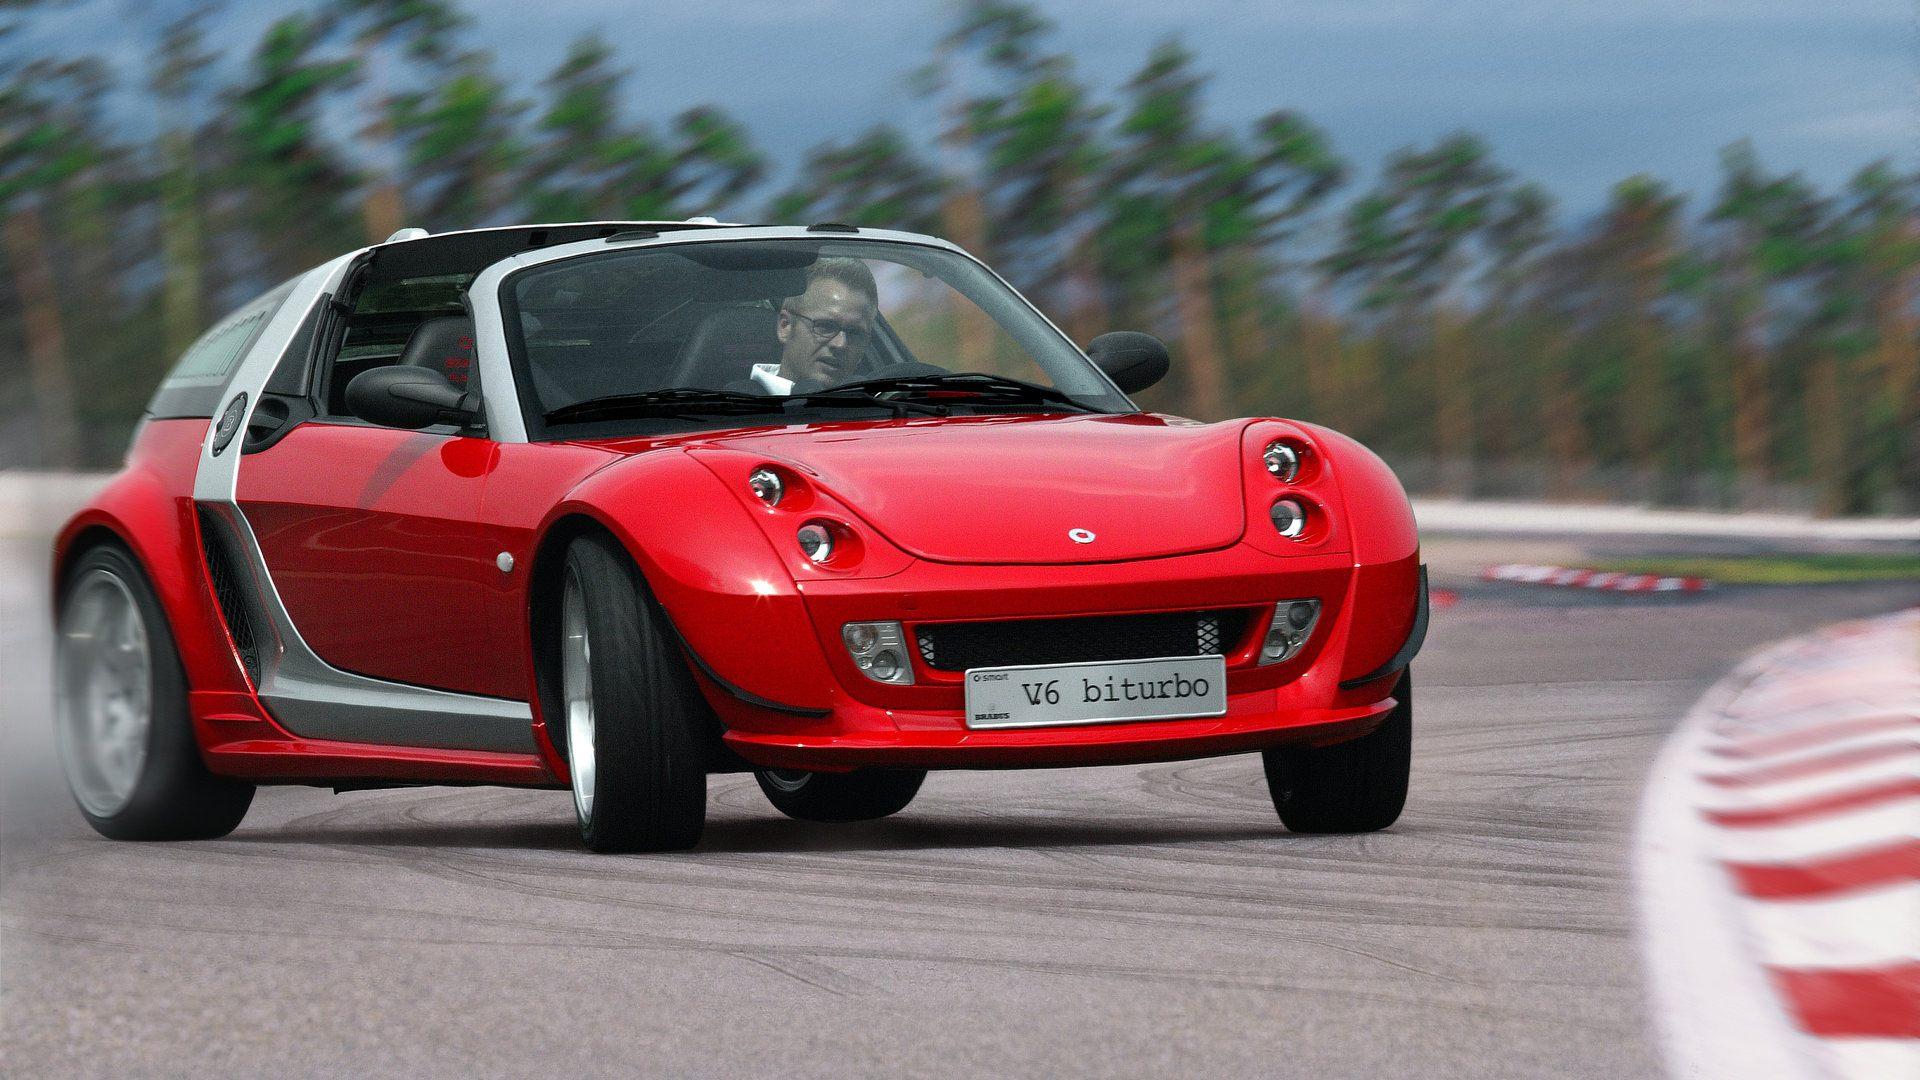 Coche del día: smart roadster BRABUS V6 biturbo